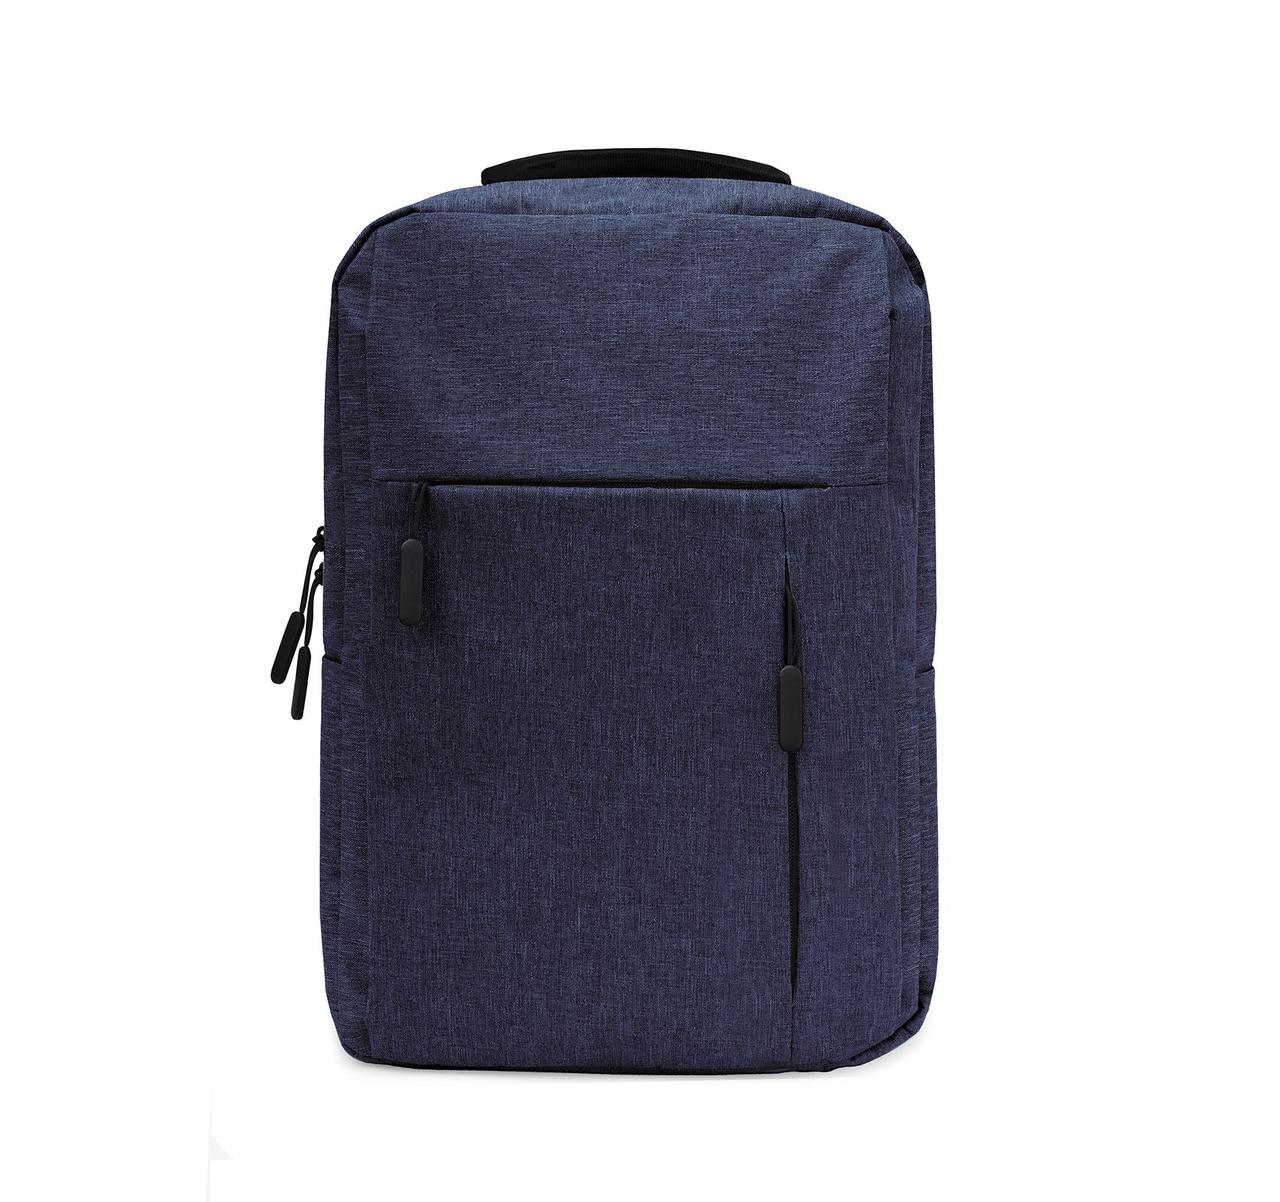 Рюкзак для ноутбука TREK, TM DISCOVER, 2 цвета